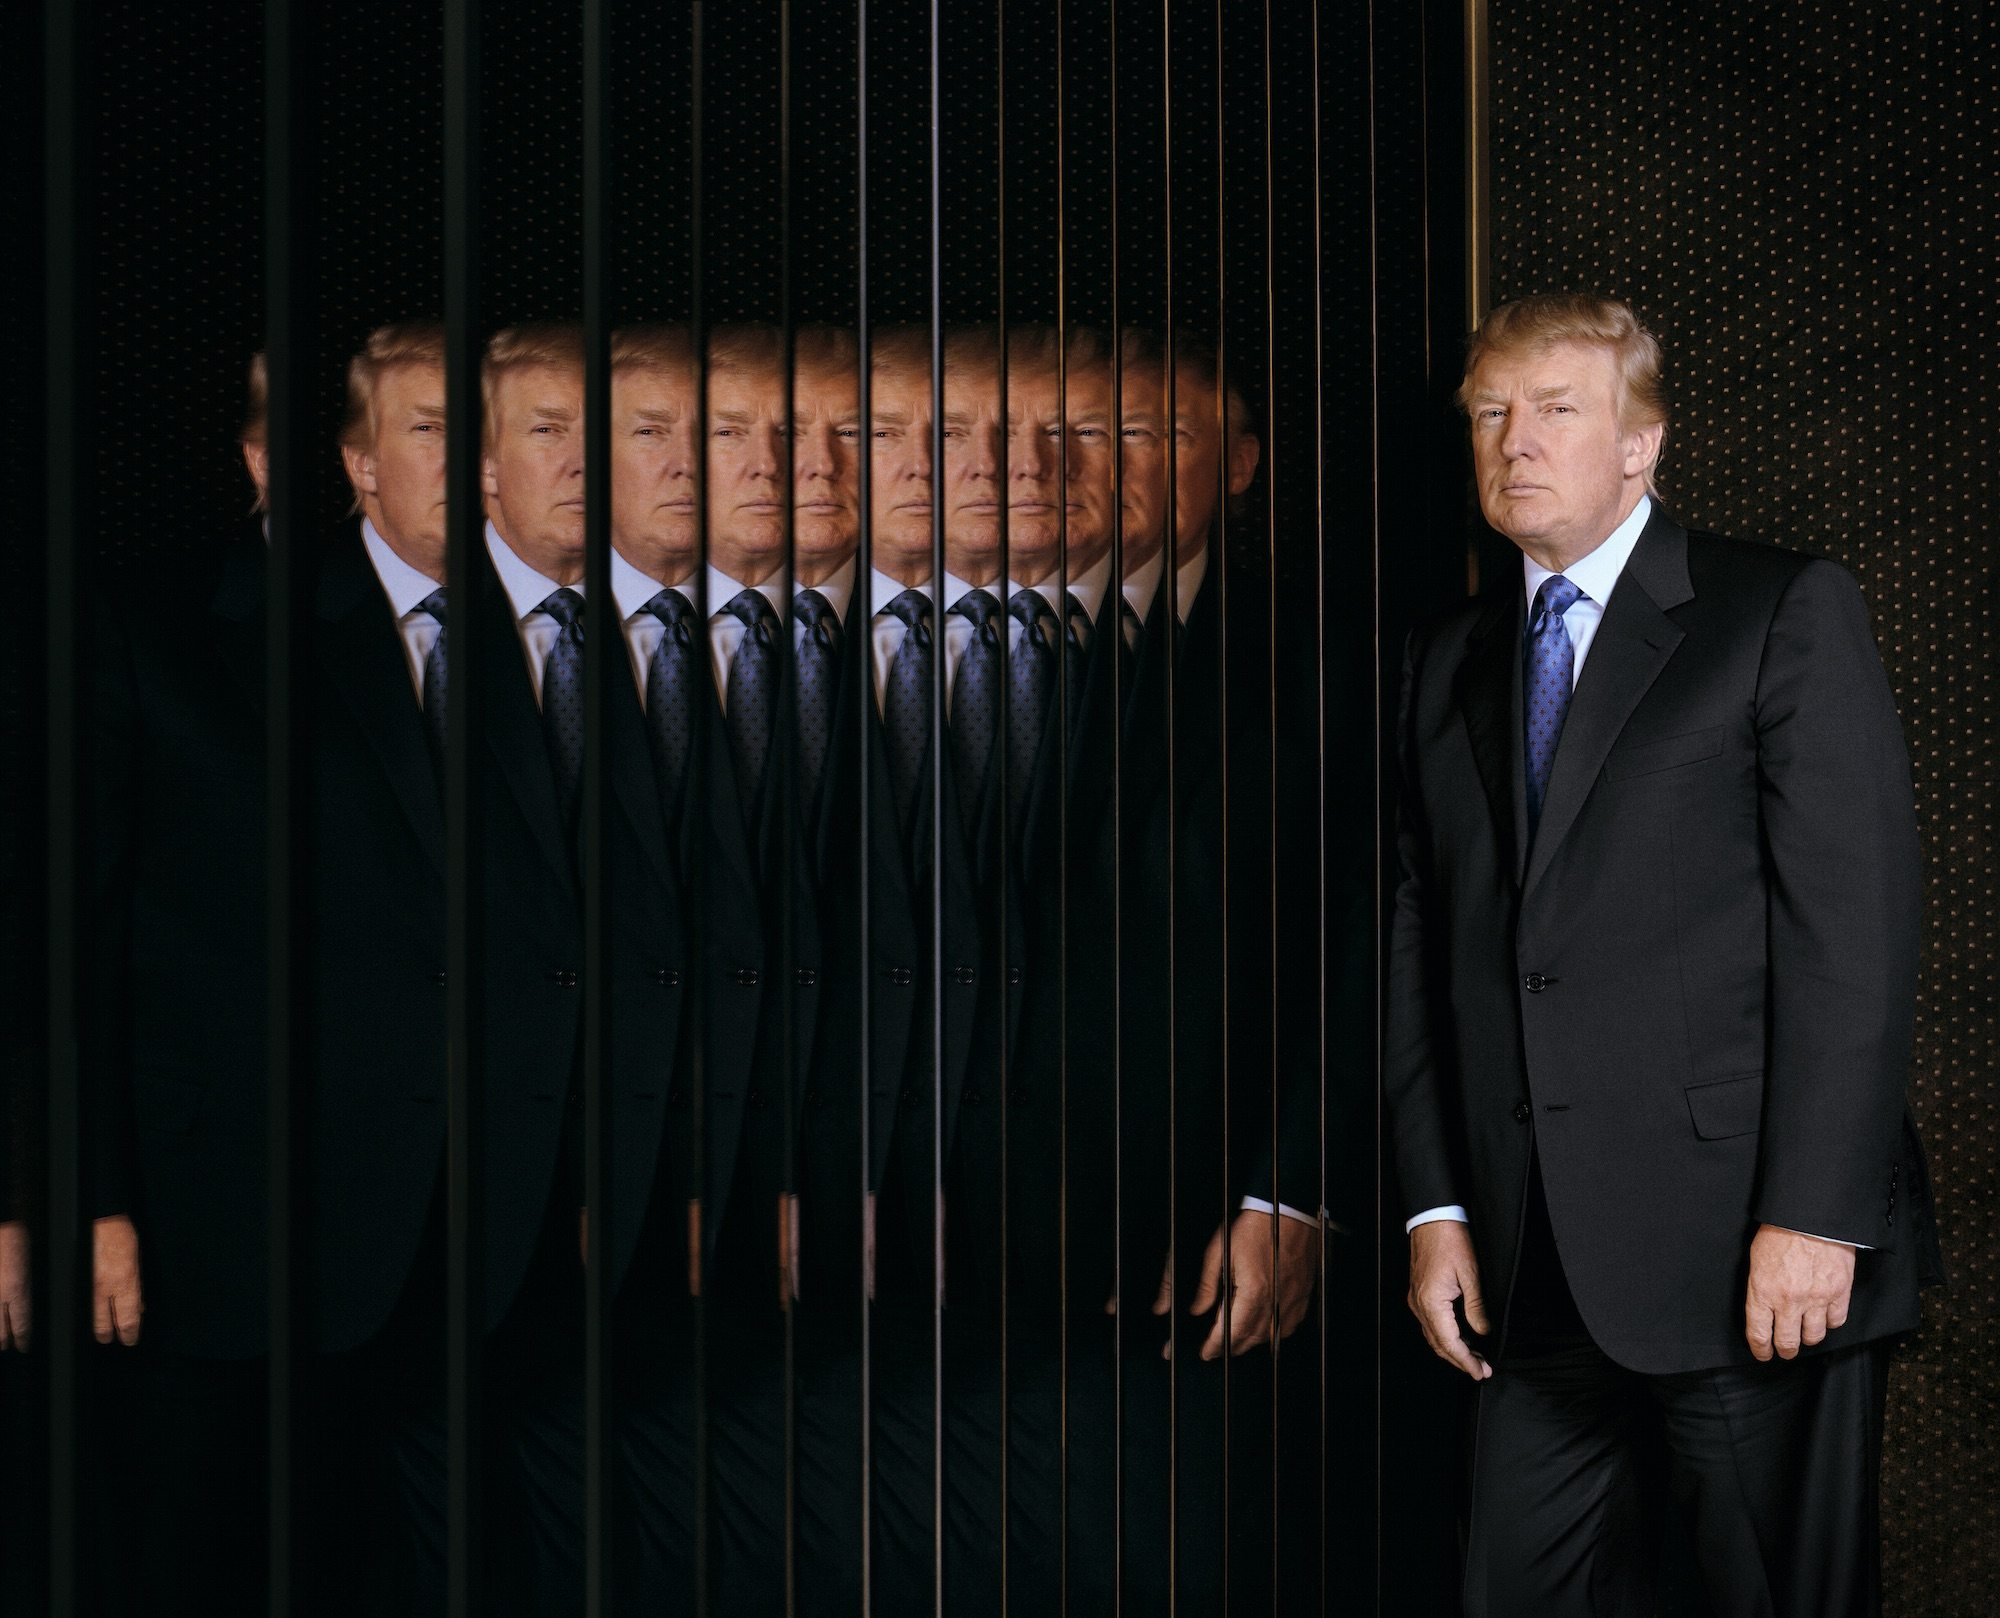 Donald_Trump_Chris_Buck_2006_V2016_s4_RGB_V3